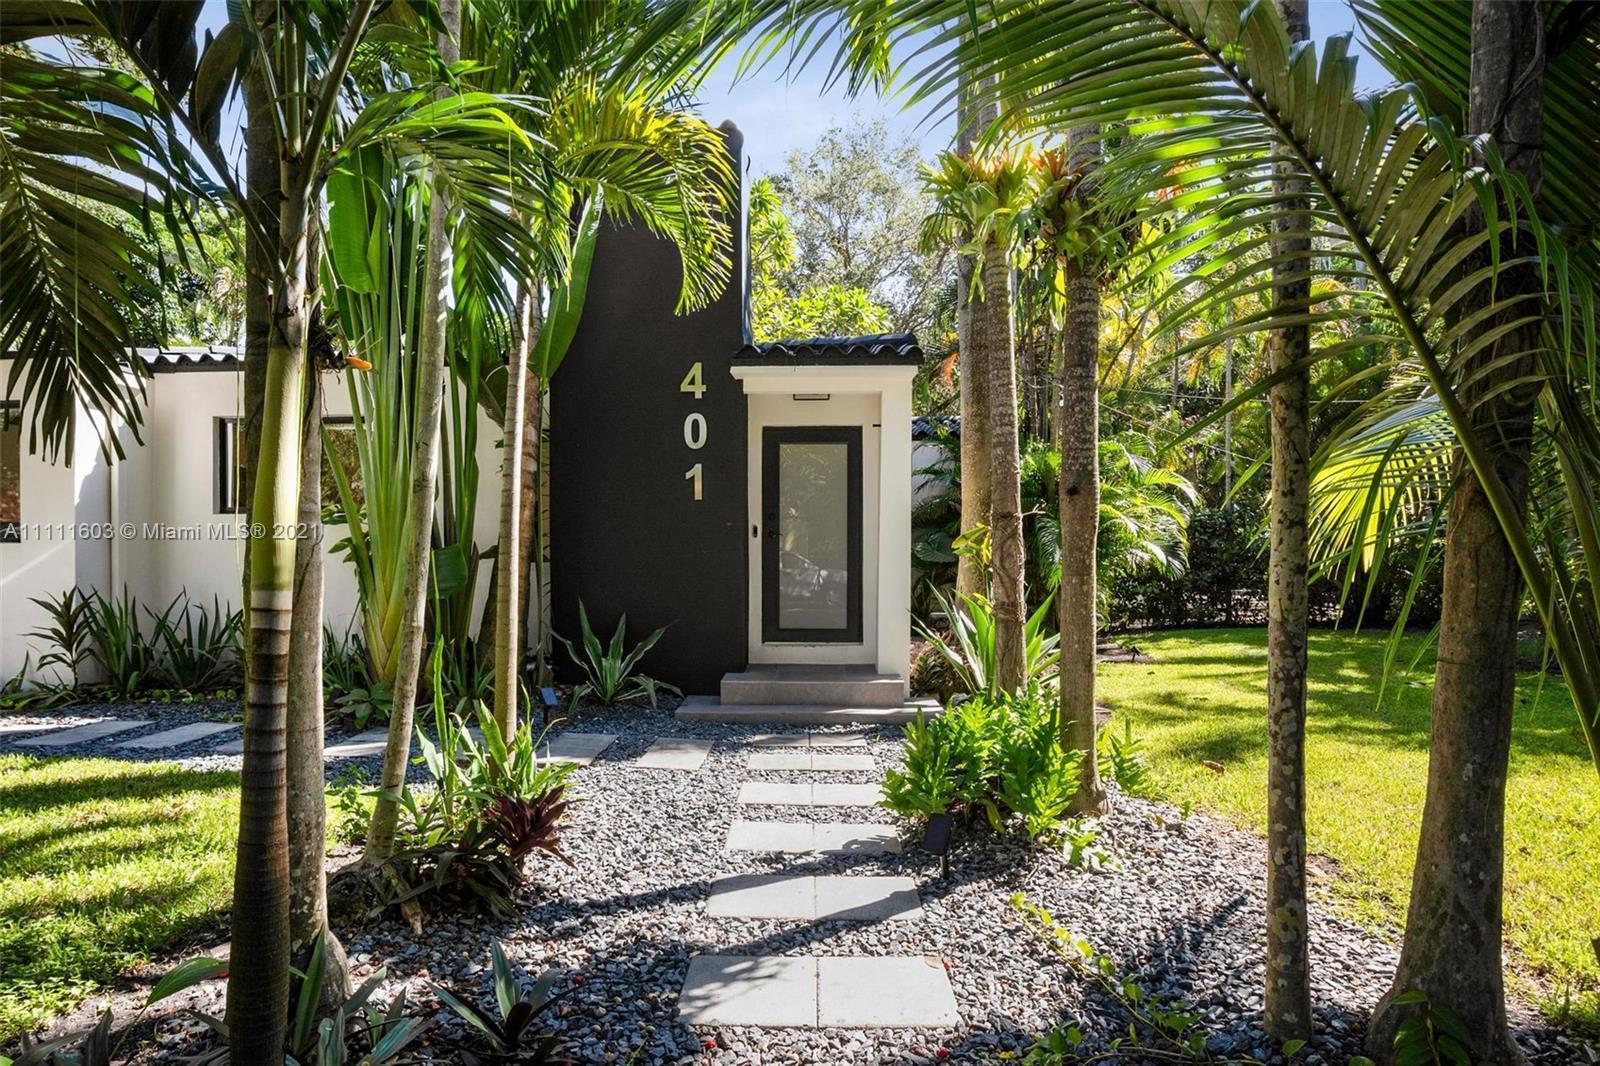 Single Family Home,For Rent,401 NE 86th St #-, El Portal, Florida 33138,Brickell,realty,broker,condos near me